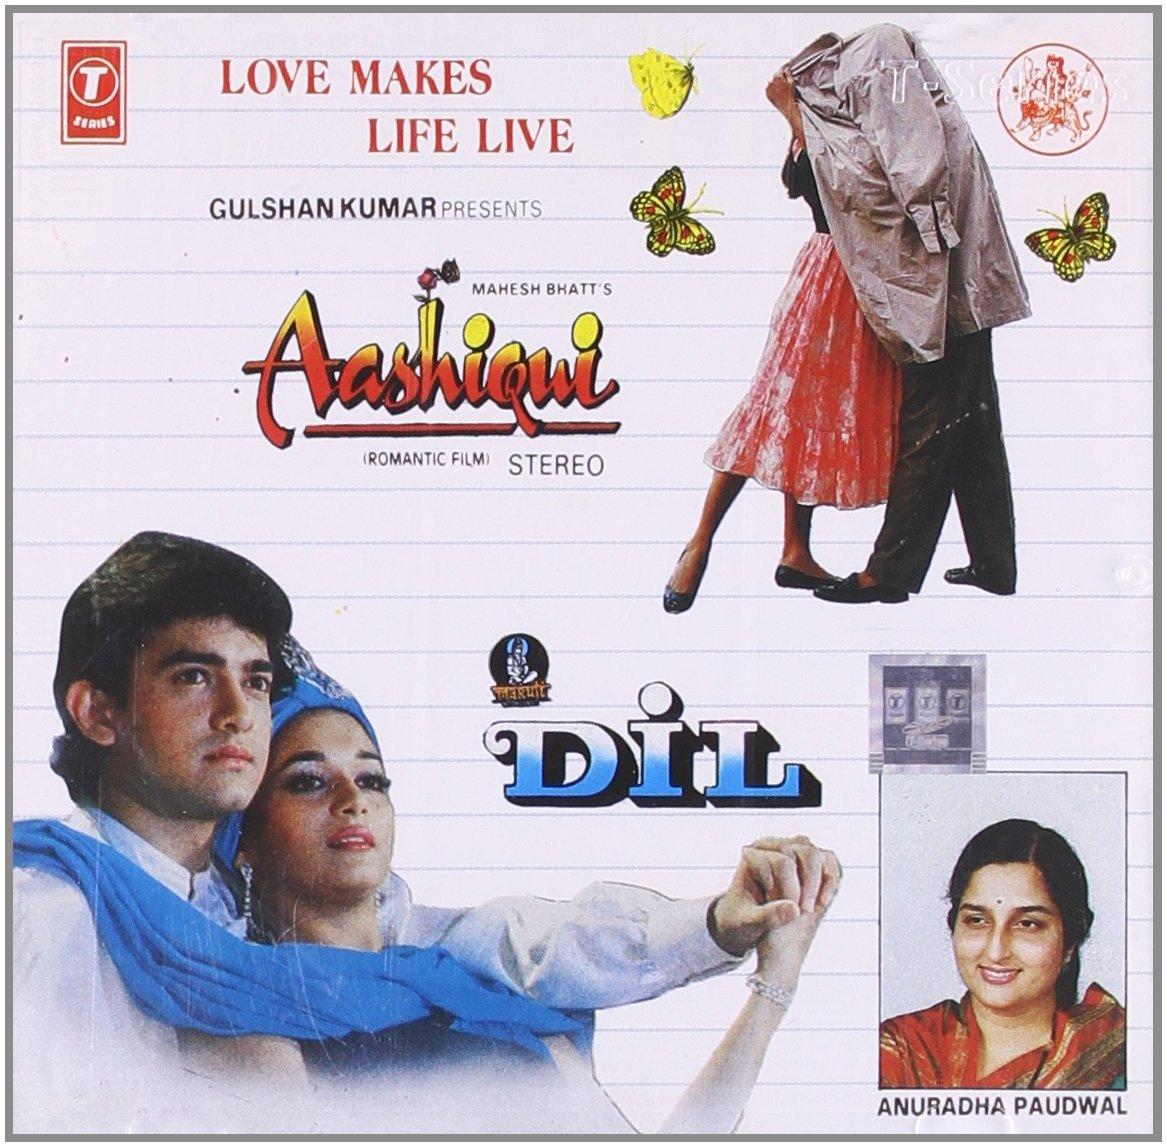 Dil- Aashiqui